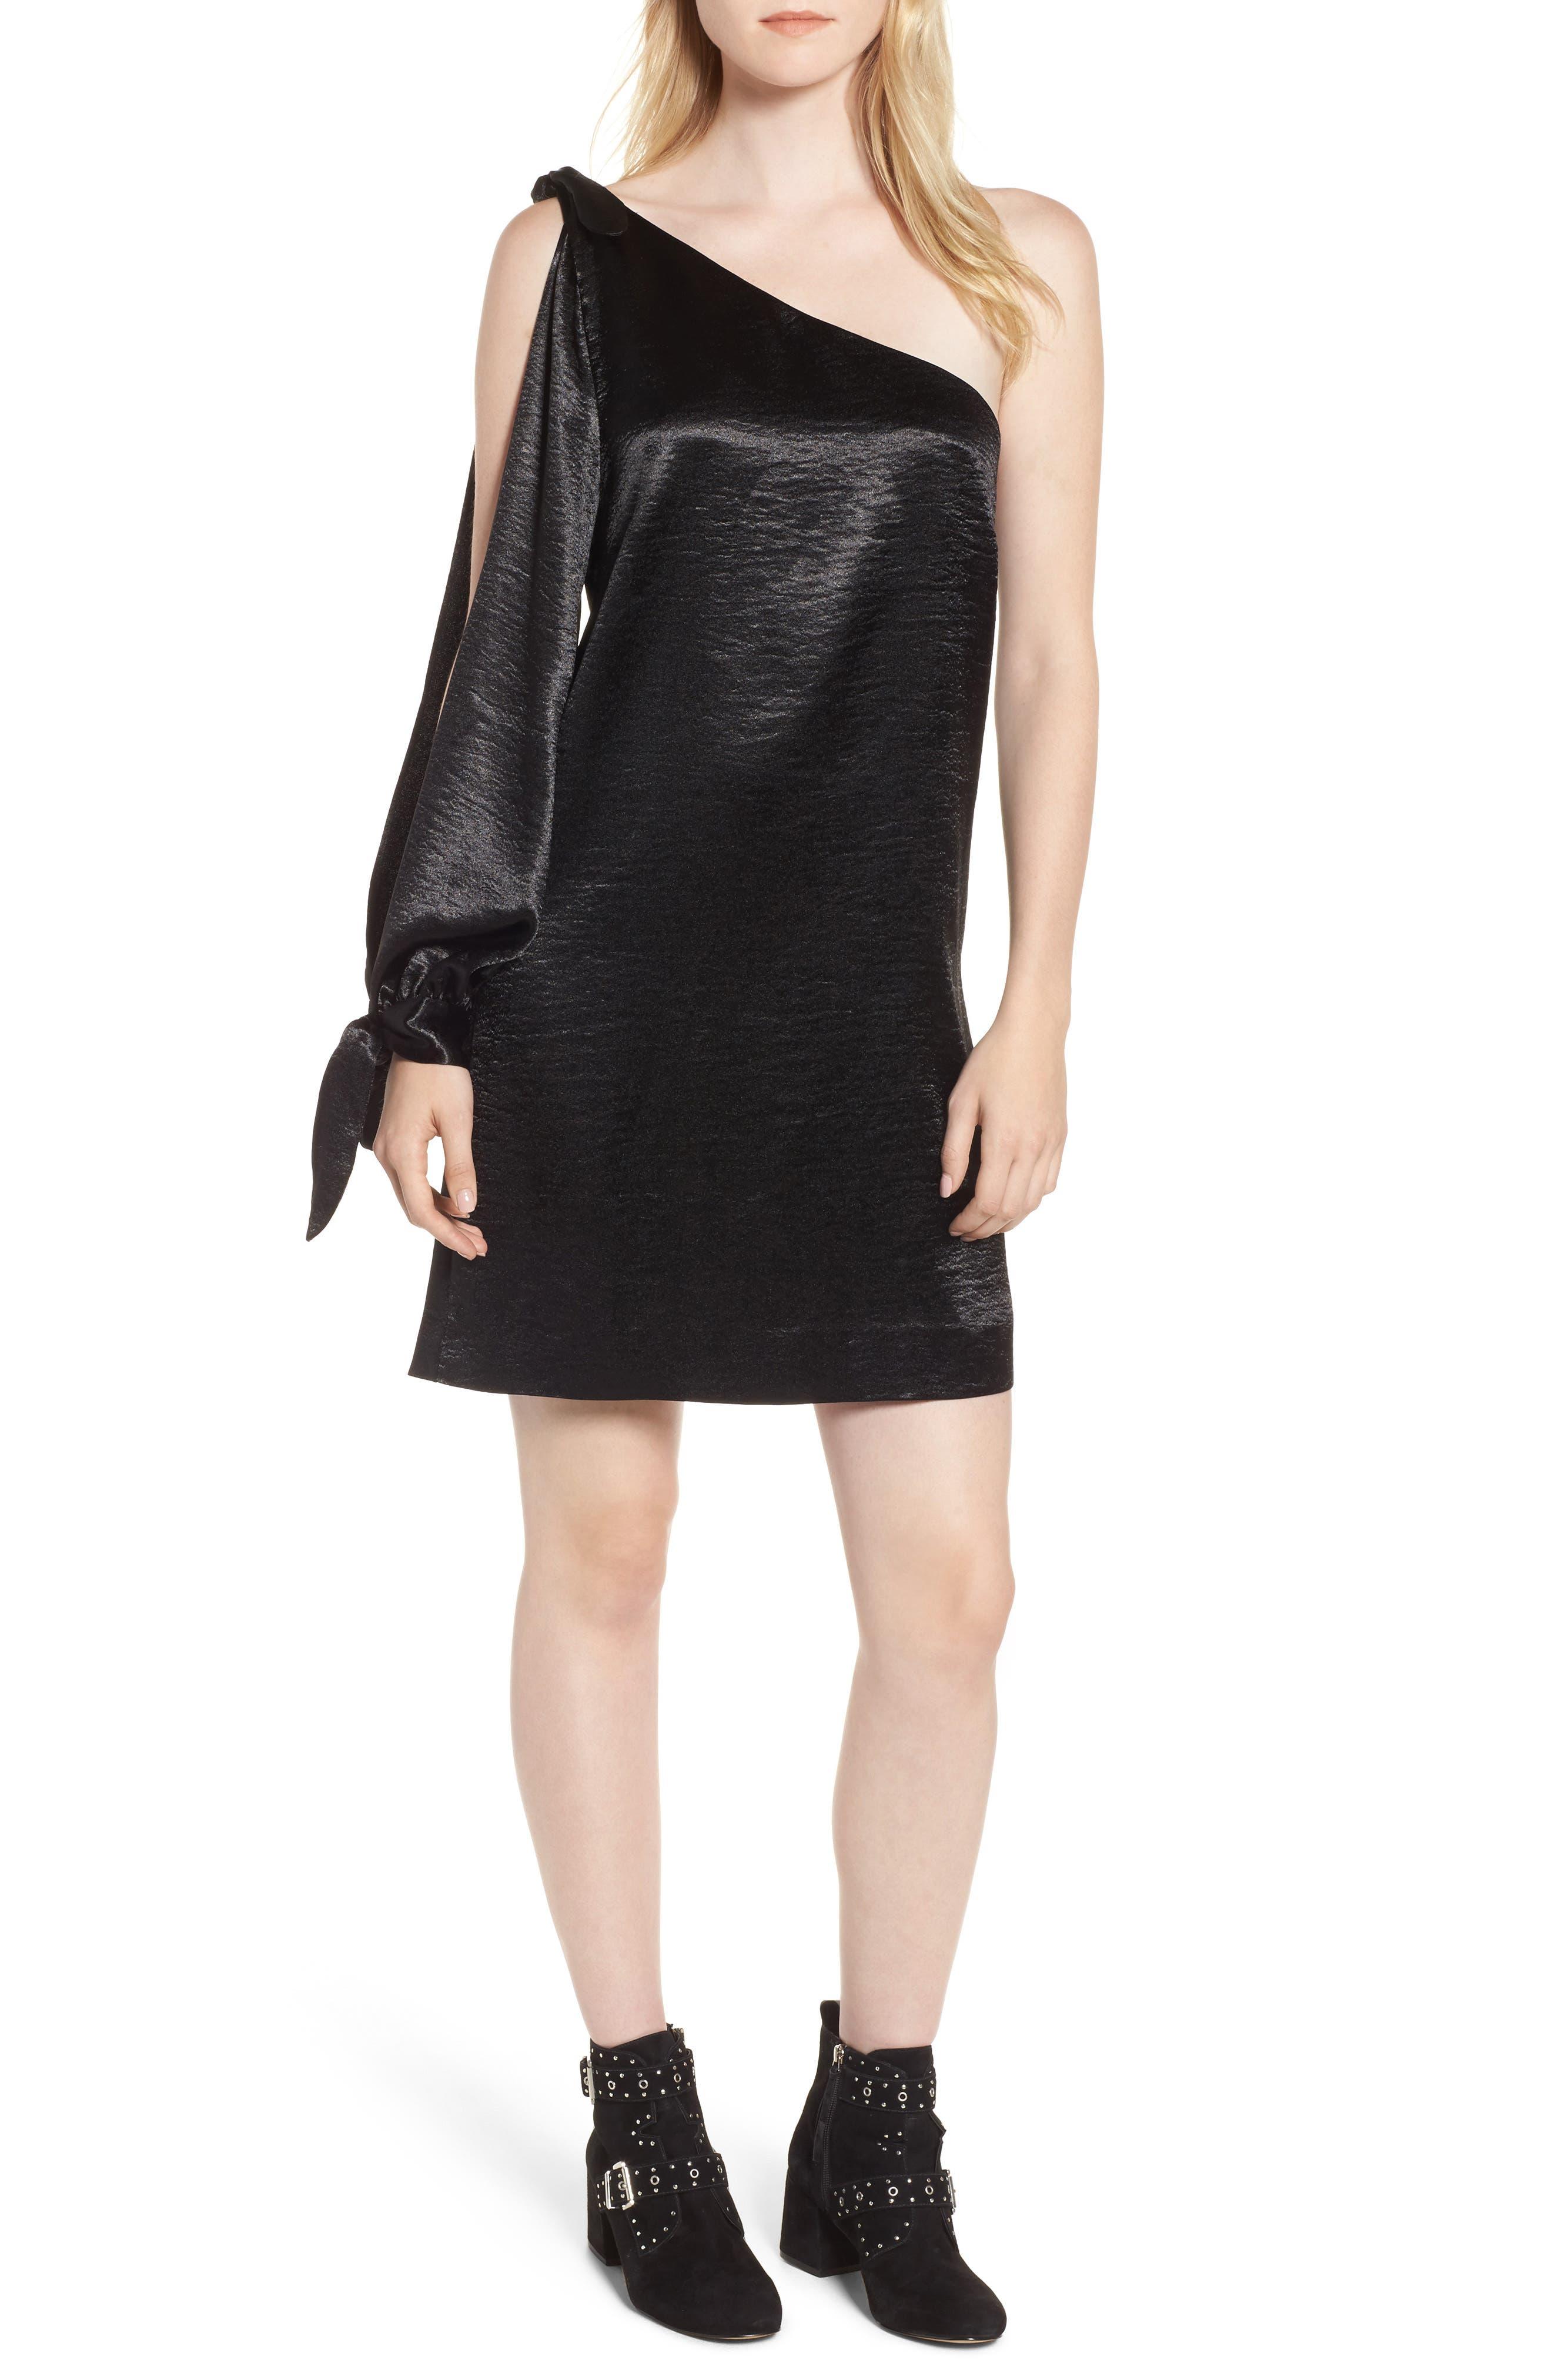 Rebecca Minkoff Nash One-Shoulder Shift Dress